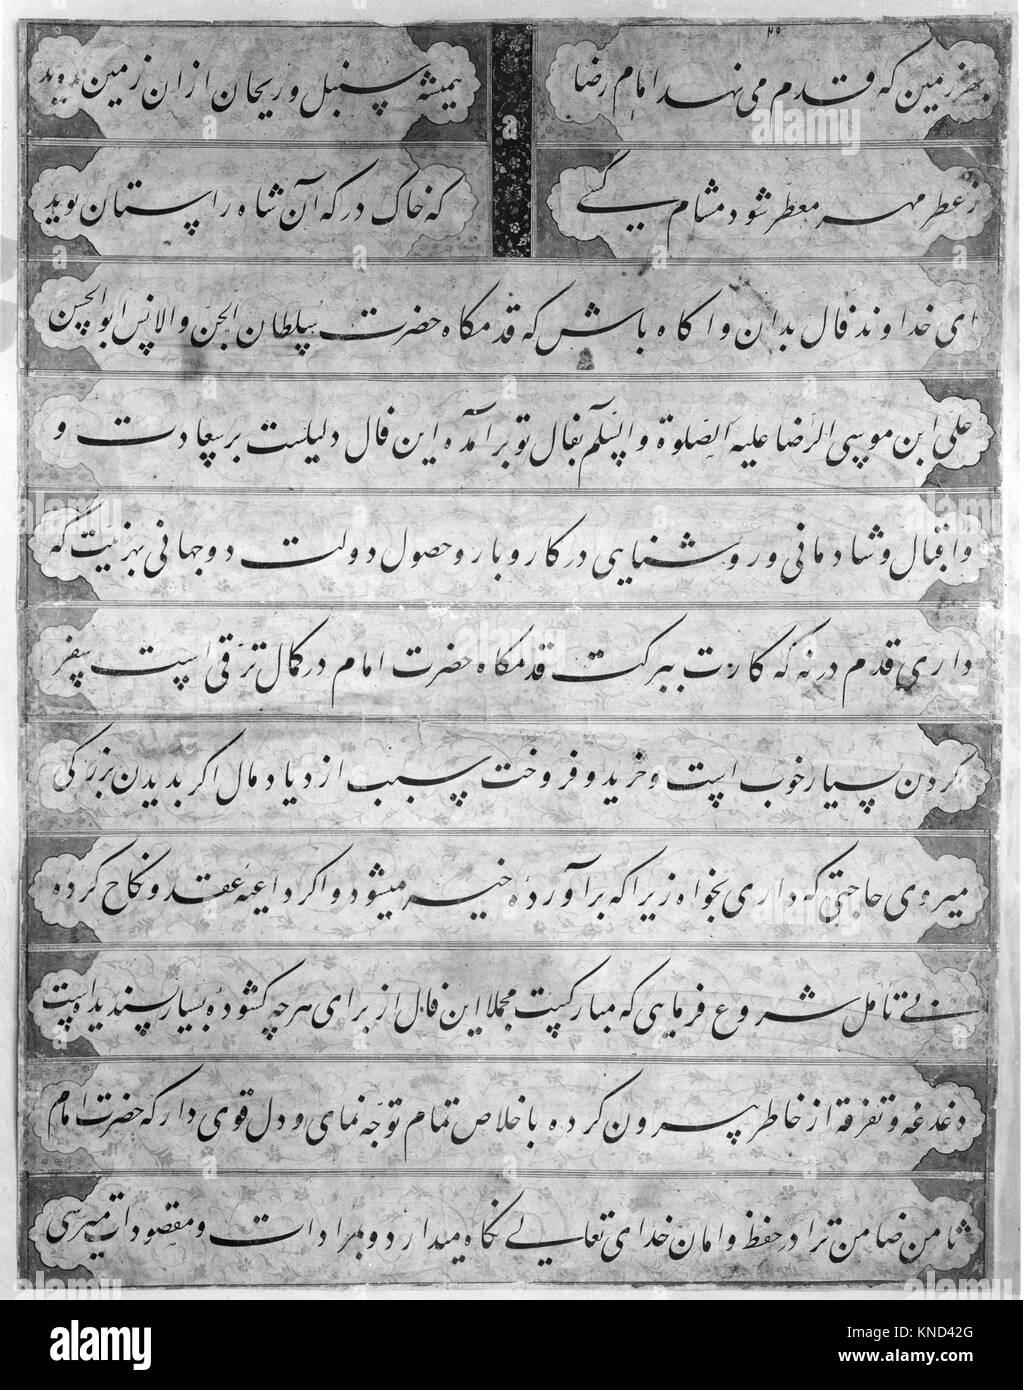 Coffin of Imam 'Ali , Folio from a Falnama (The Book of Omens) of Ja'far al-Sadiq MET 150860 451017 - Stock Image